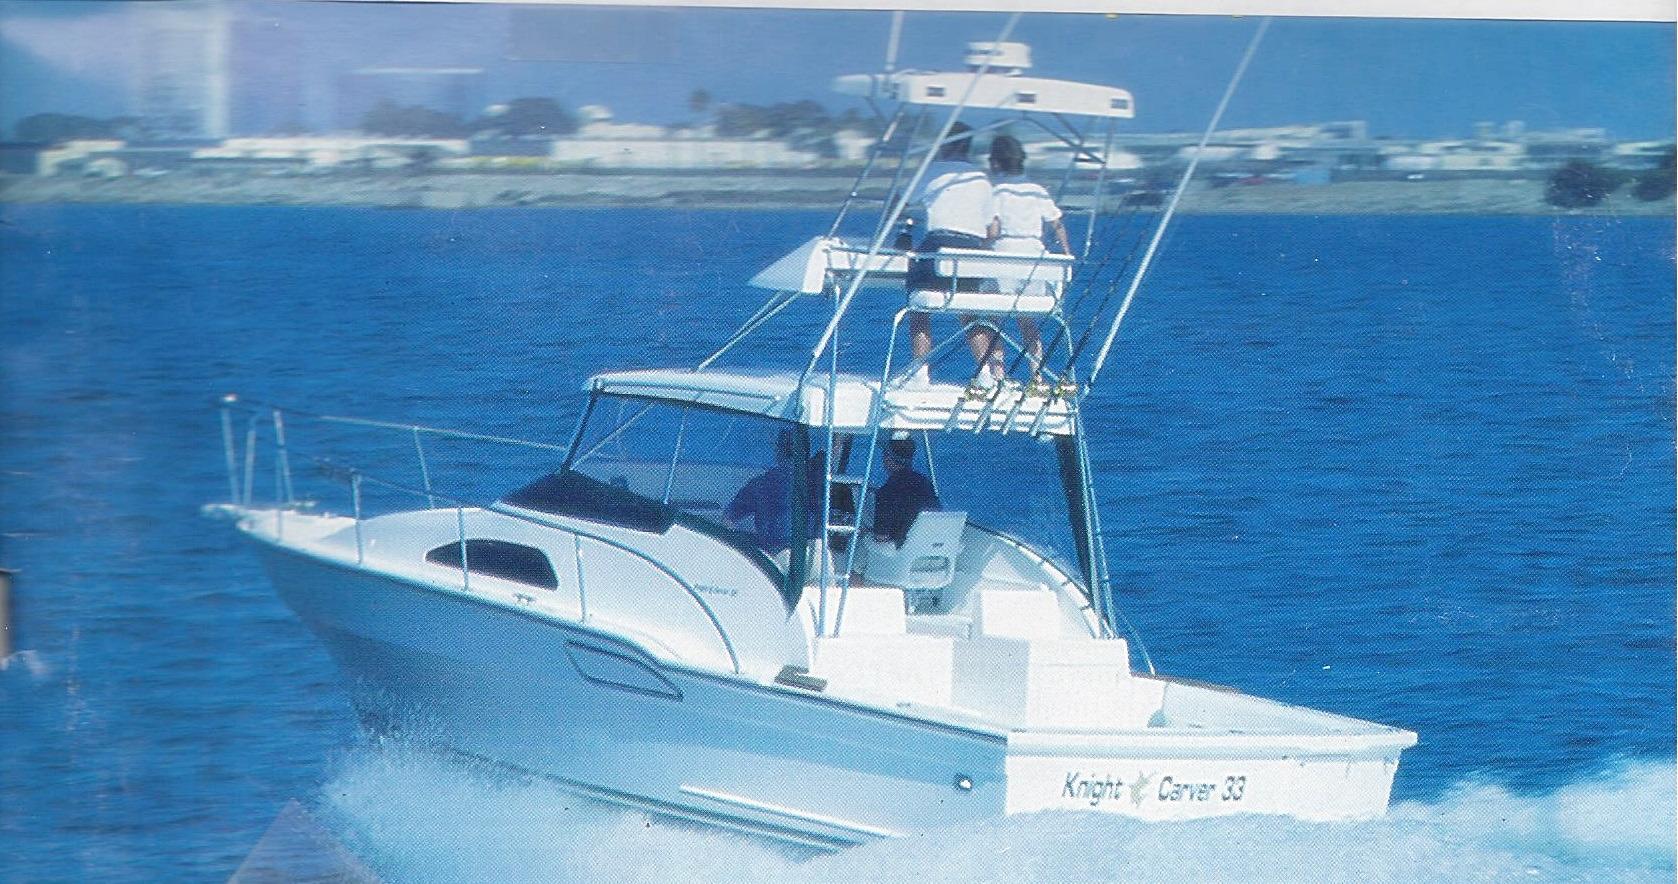 33' Knight & Carver Sportfisher+Boat for sale!